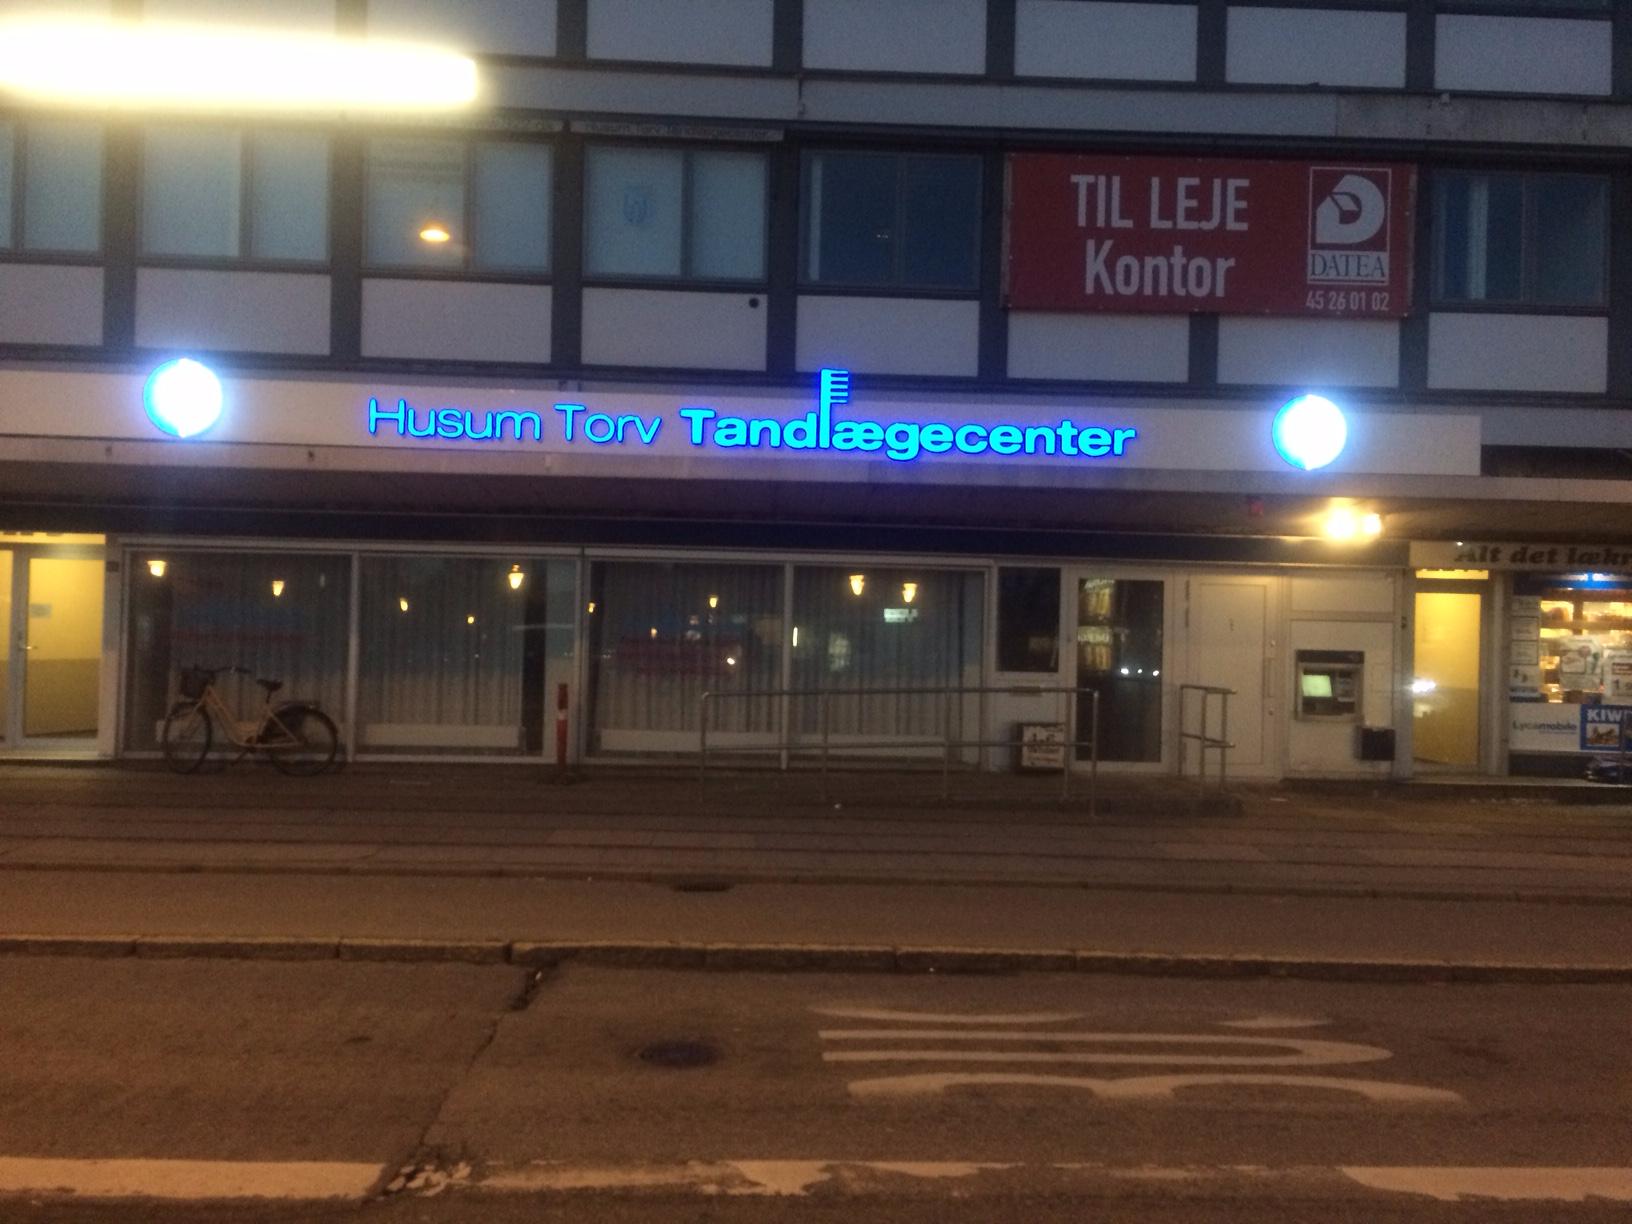 Husum Torv Tandlægecenter